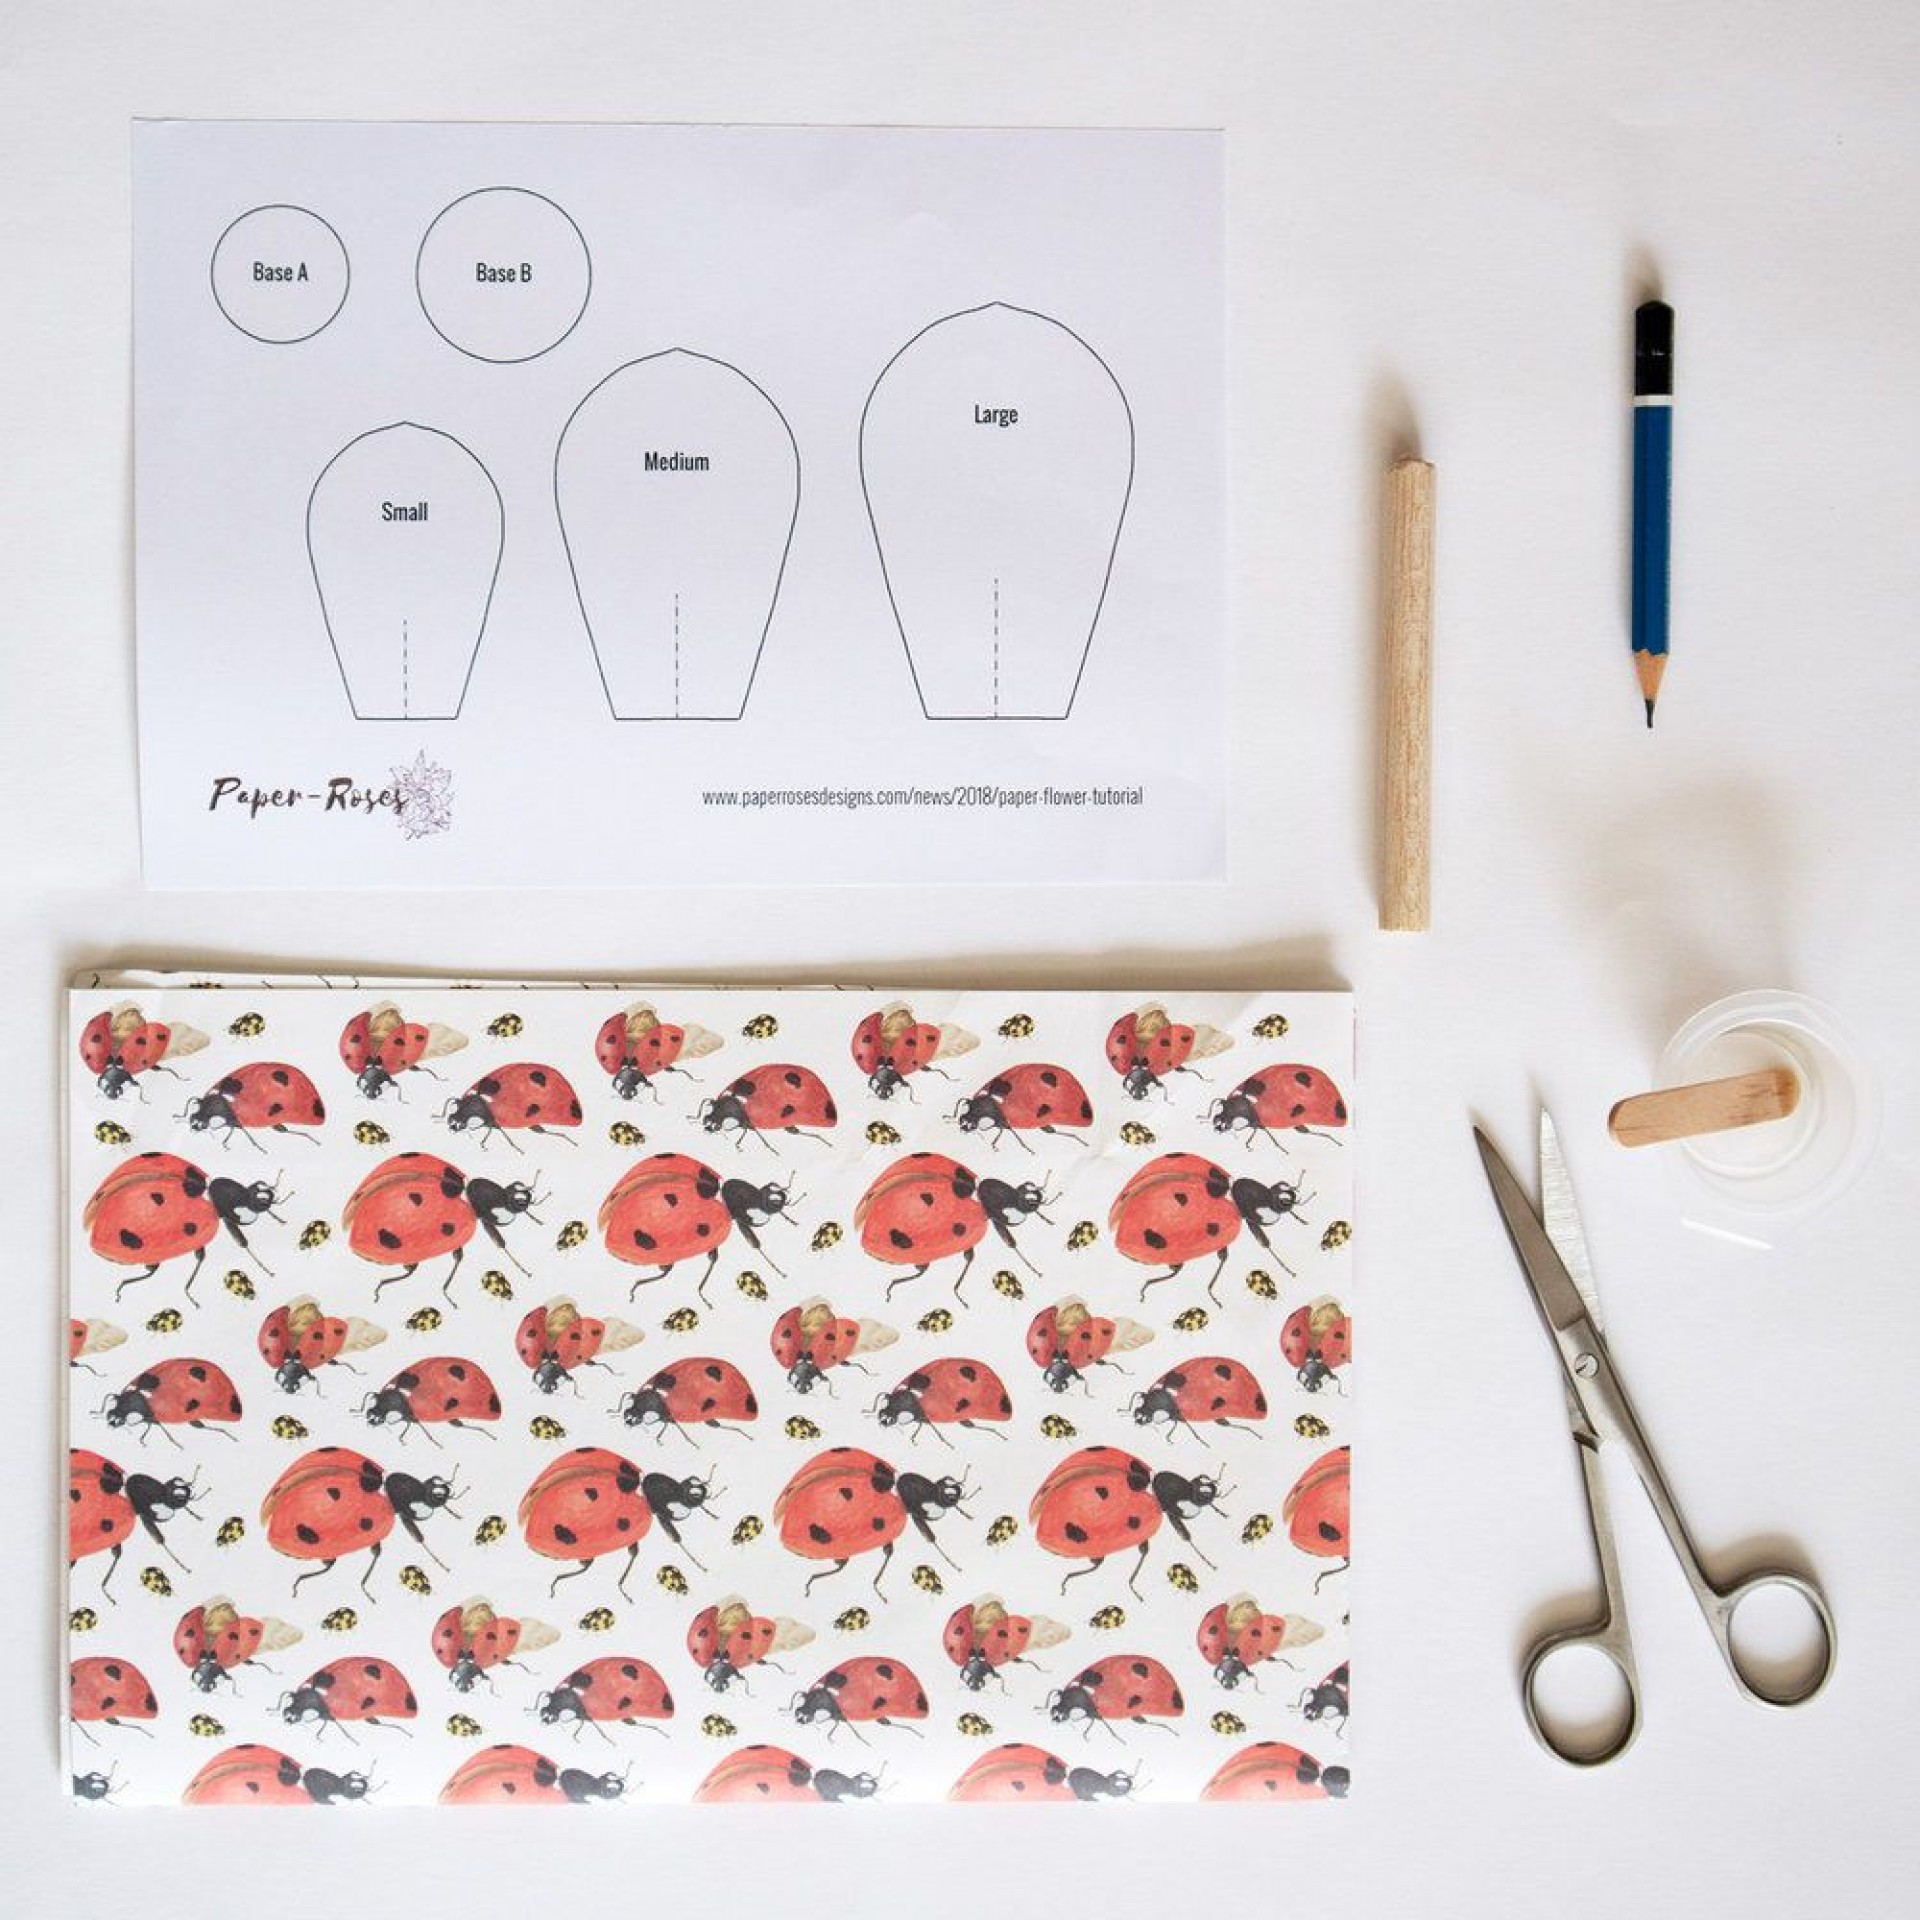 008 Impressive Free Printable Diy Paper Flower Template High Definition  Templates1920